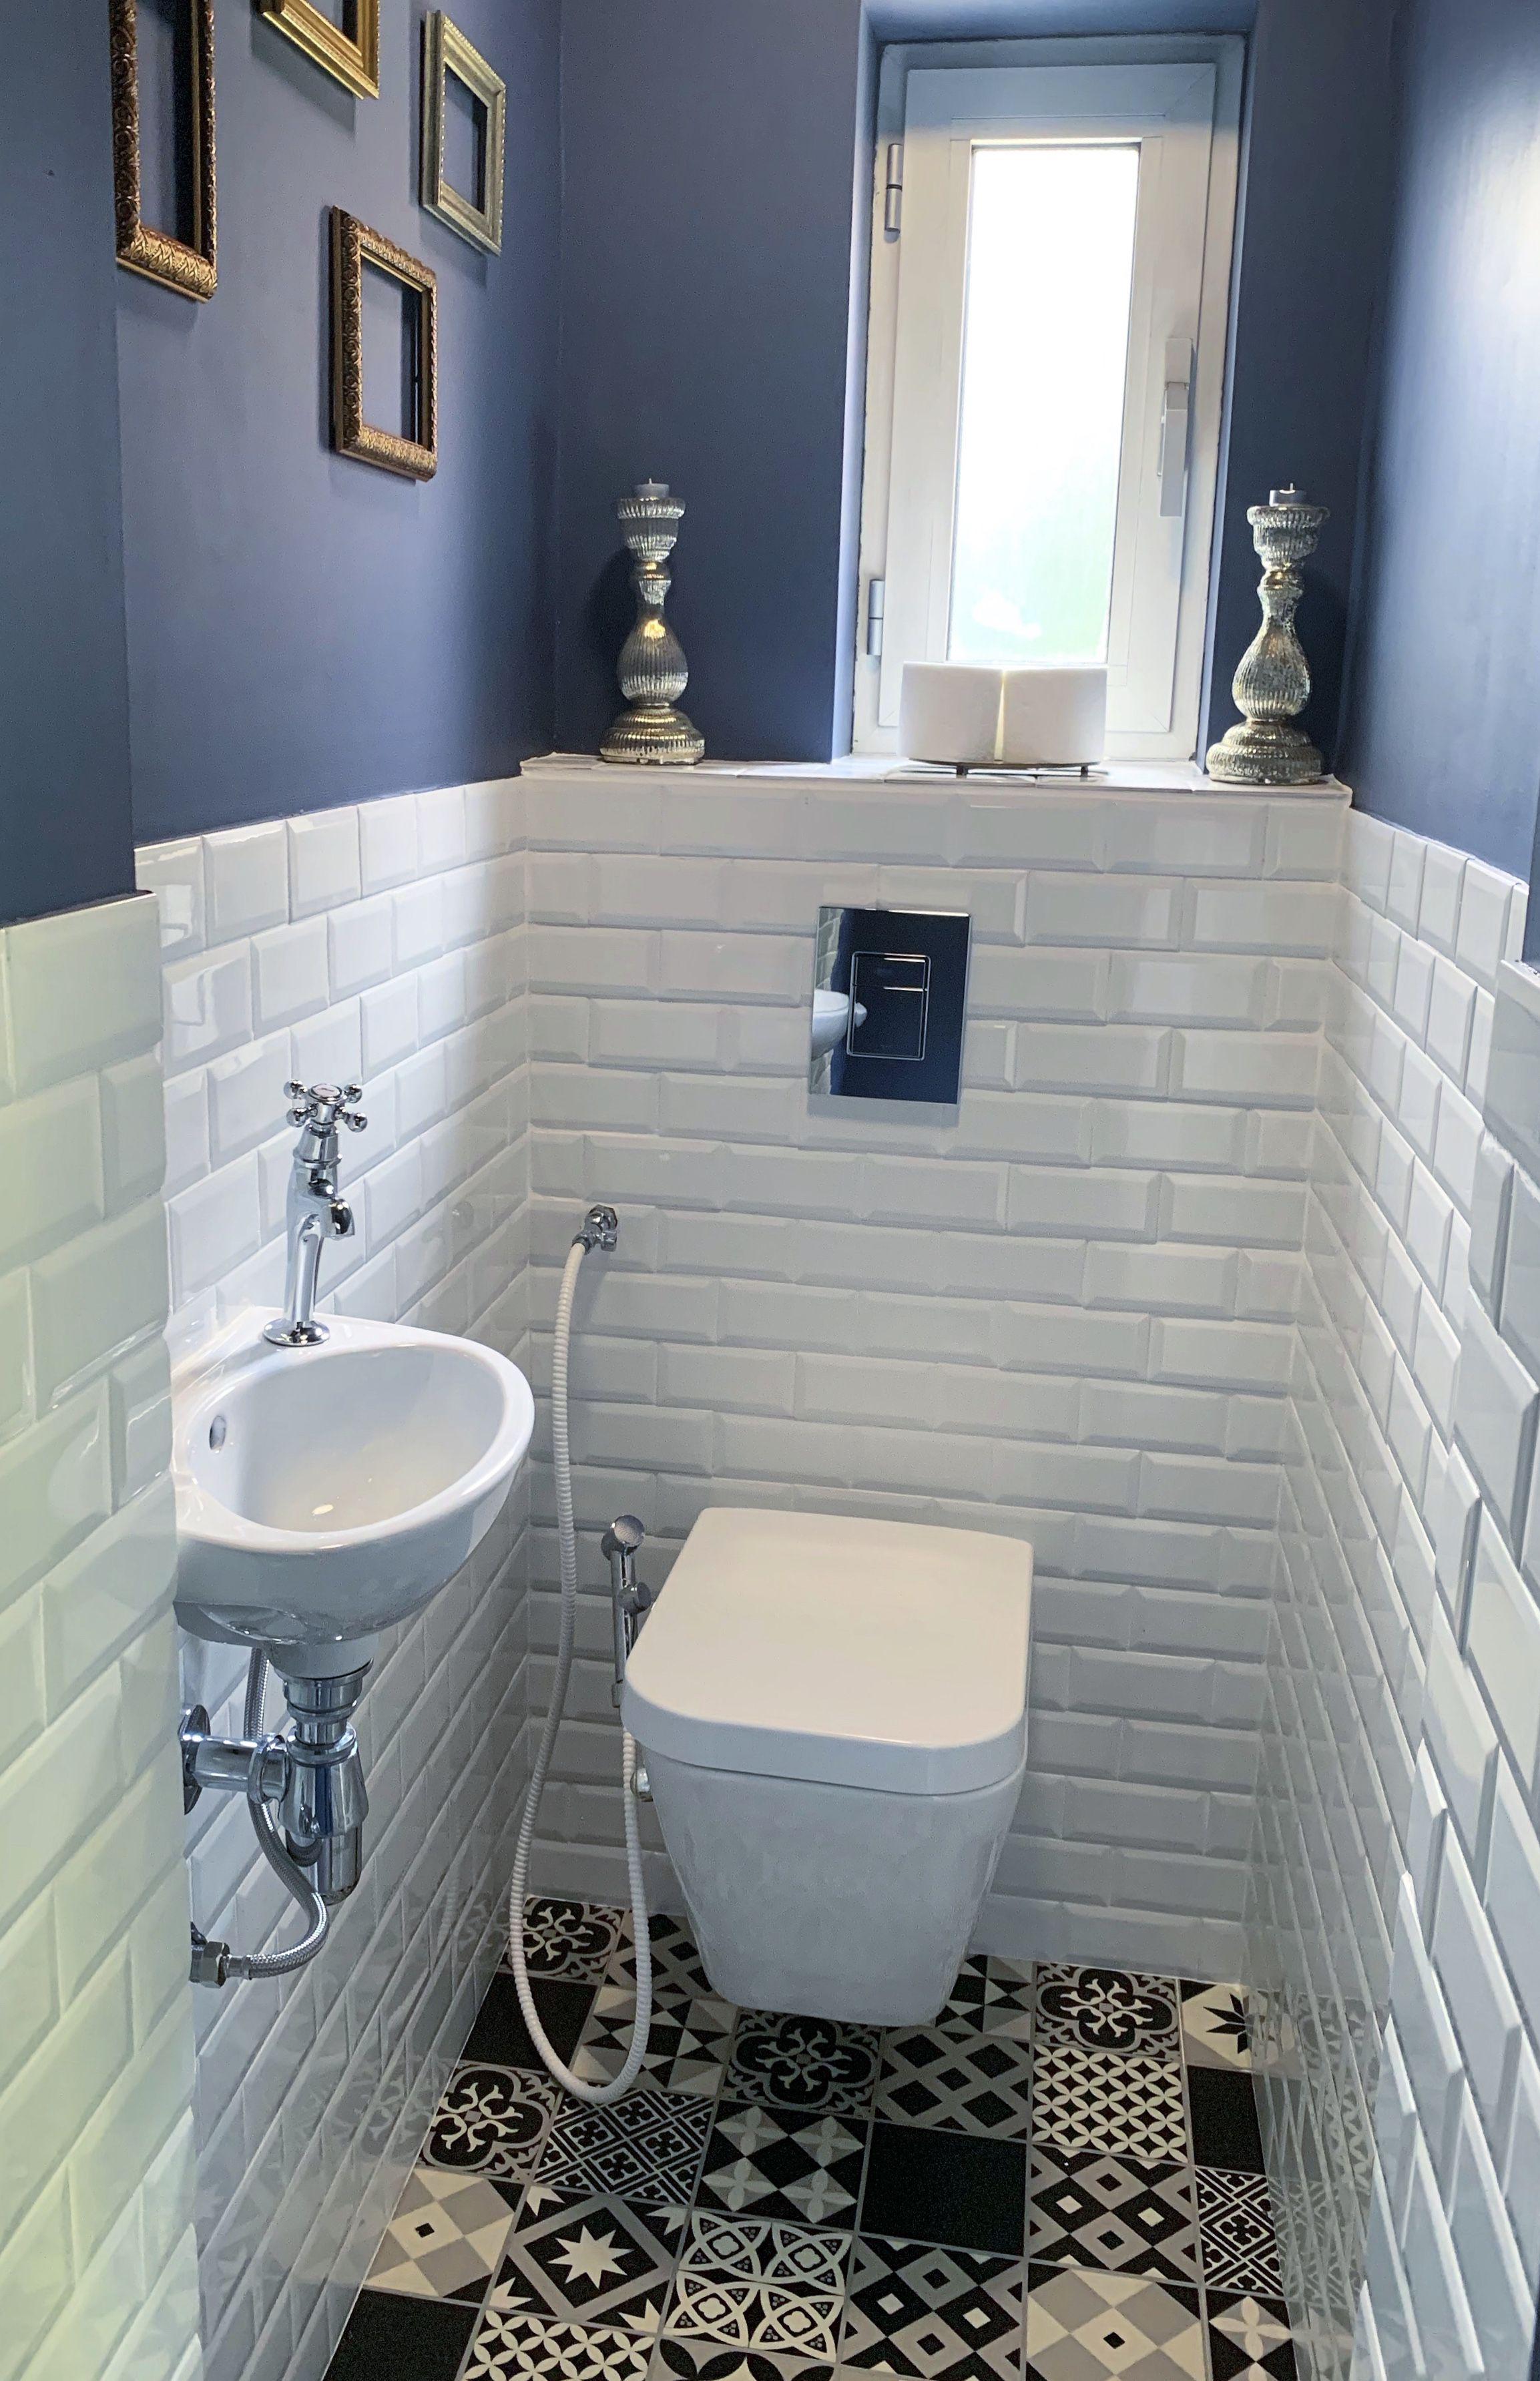 Mon Mari A Renove Nos Toilettes Lave Main Faience Metro Blanc Et Peinture Bleue Au Mur Toilettes Suspendues Toilette Suspendu Idee Deco Toilettes Toilettes